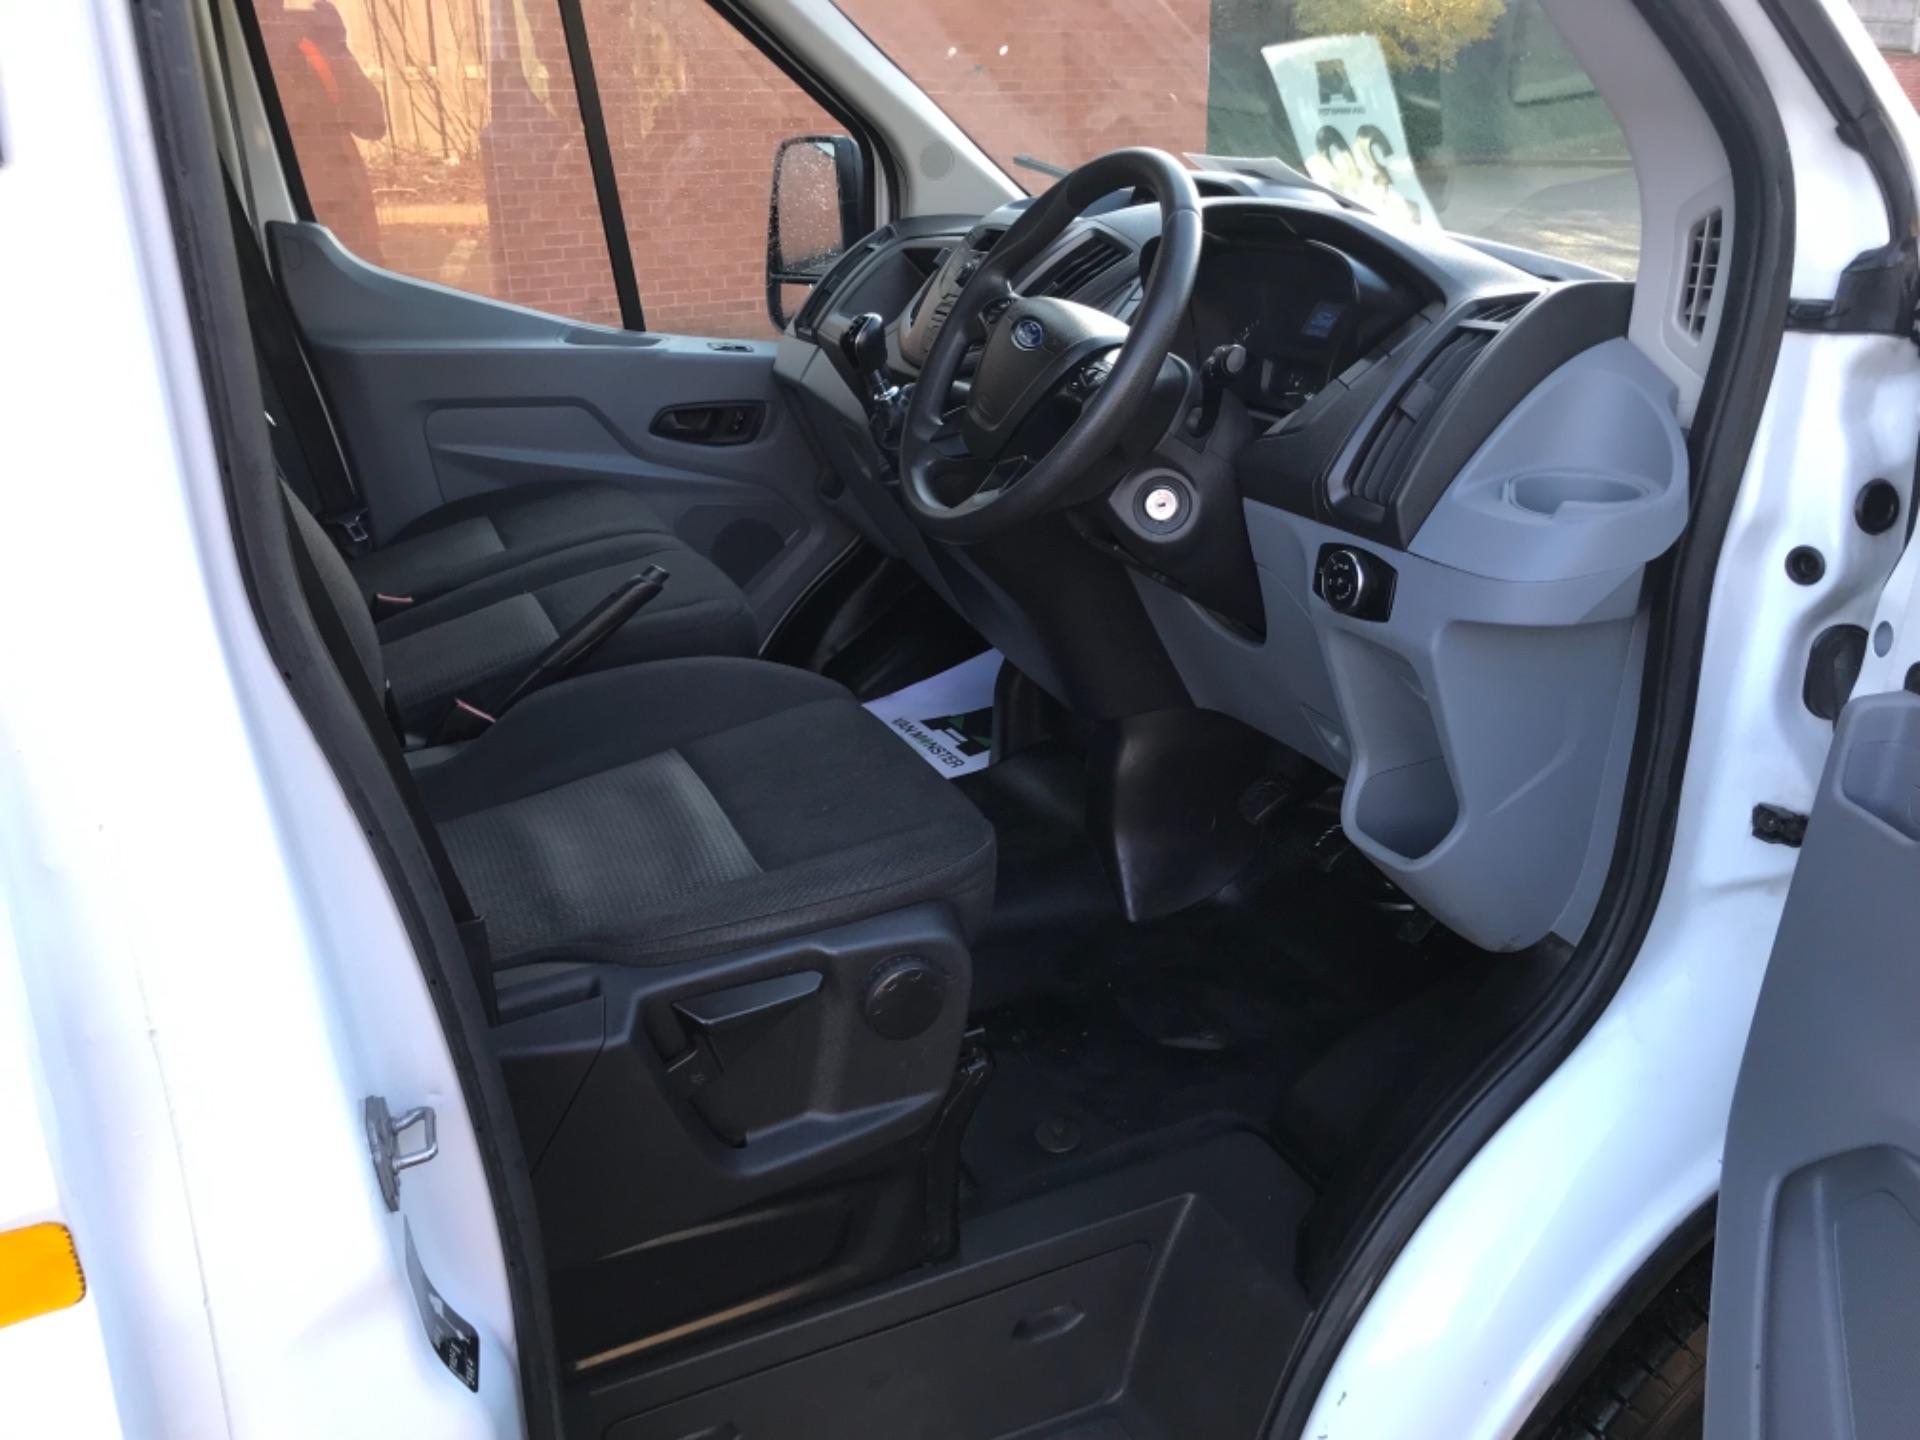 2016 Ford Transit 2.2 Tdci 125Ps Dropside DRW Tail lift (YS66SNU) Image 9